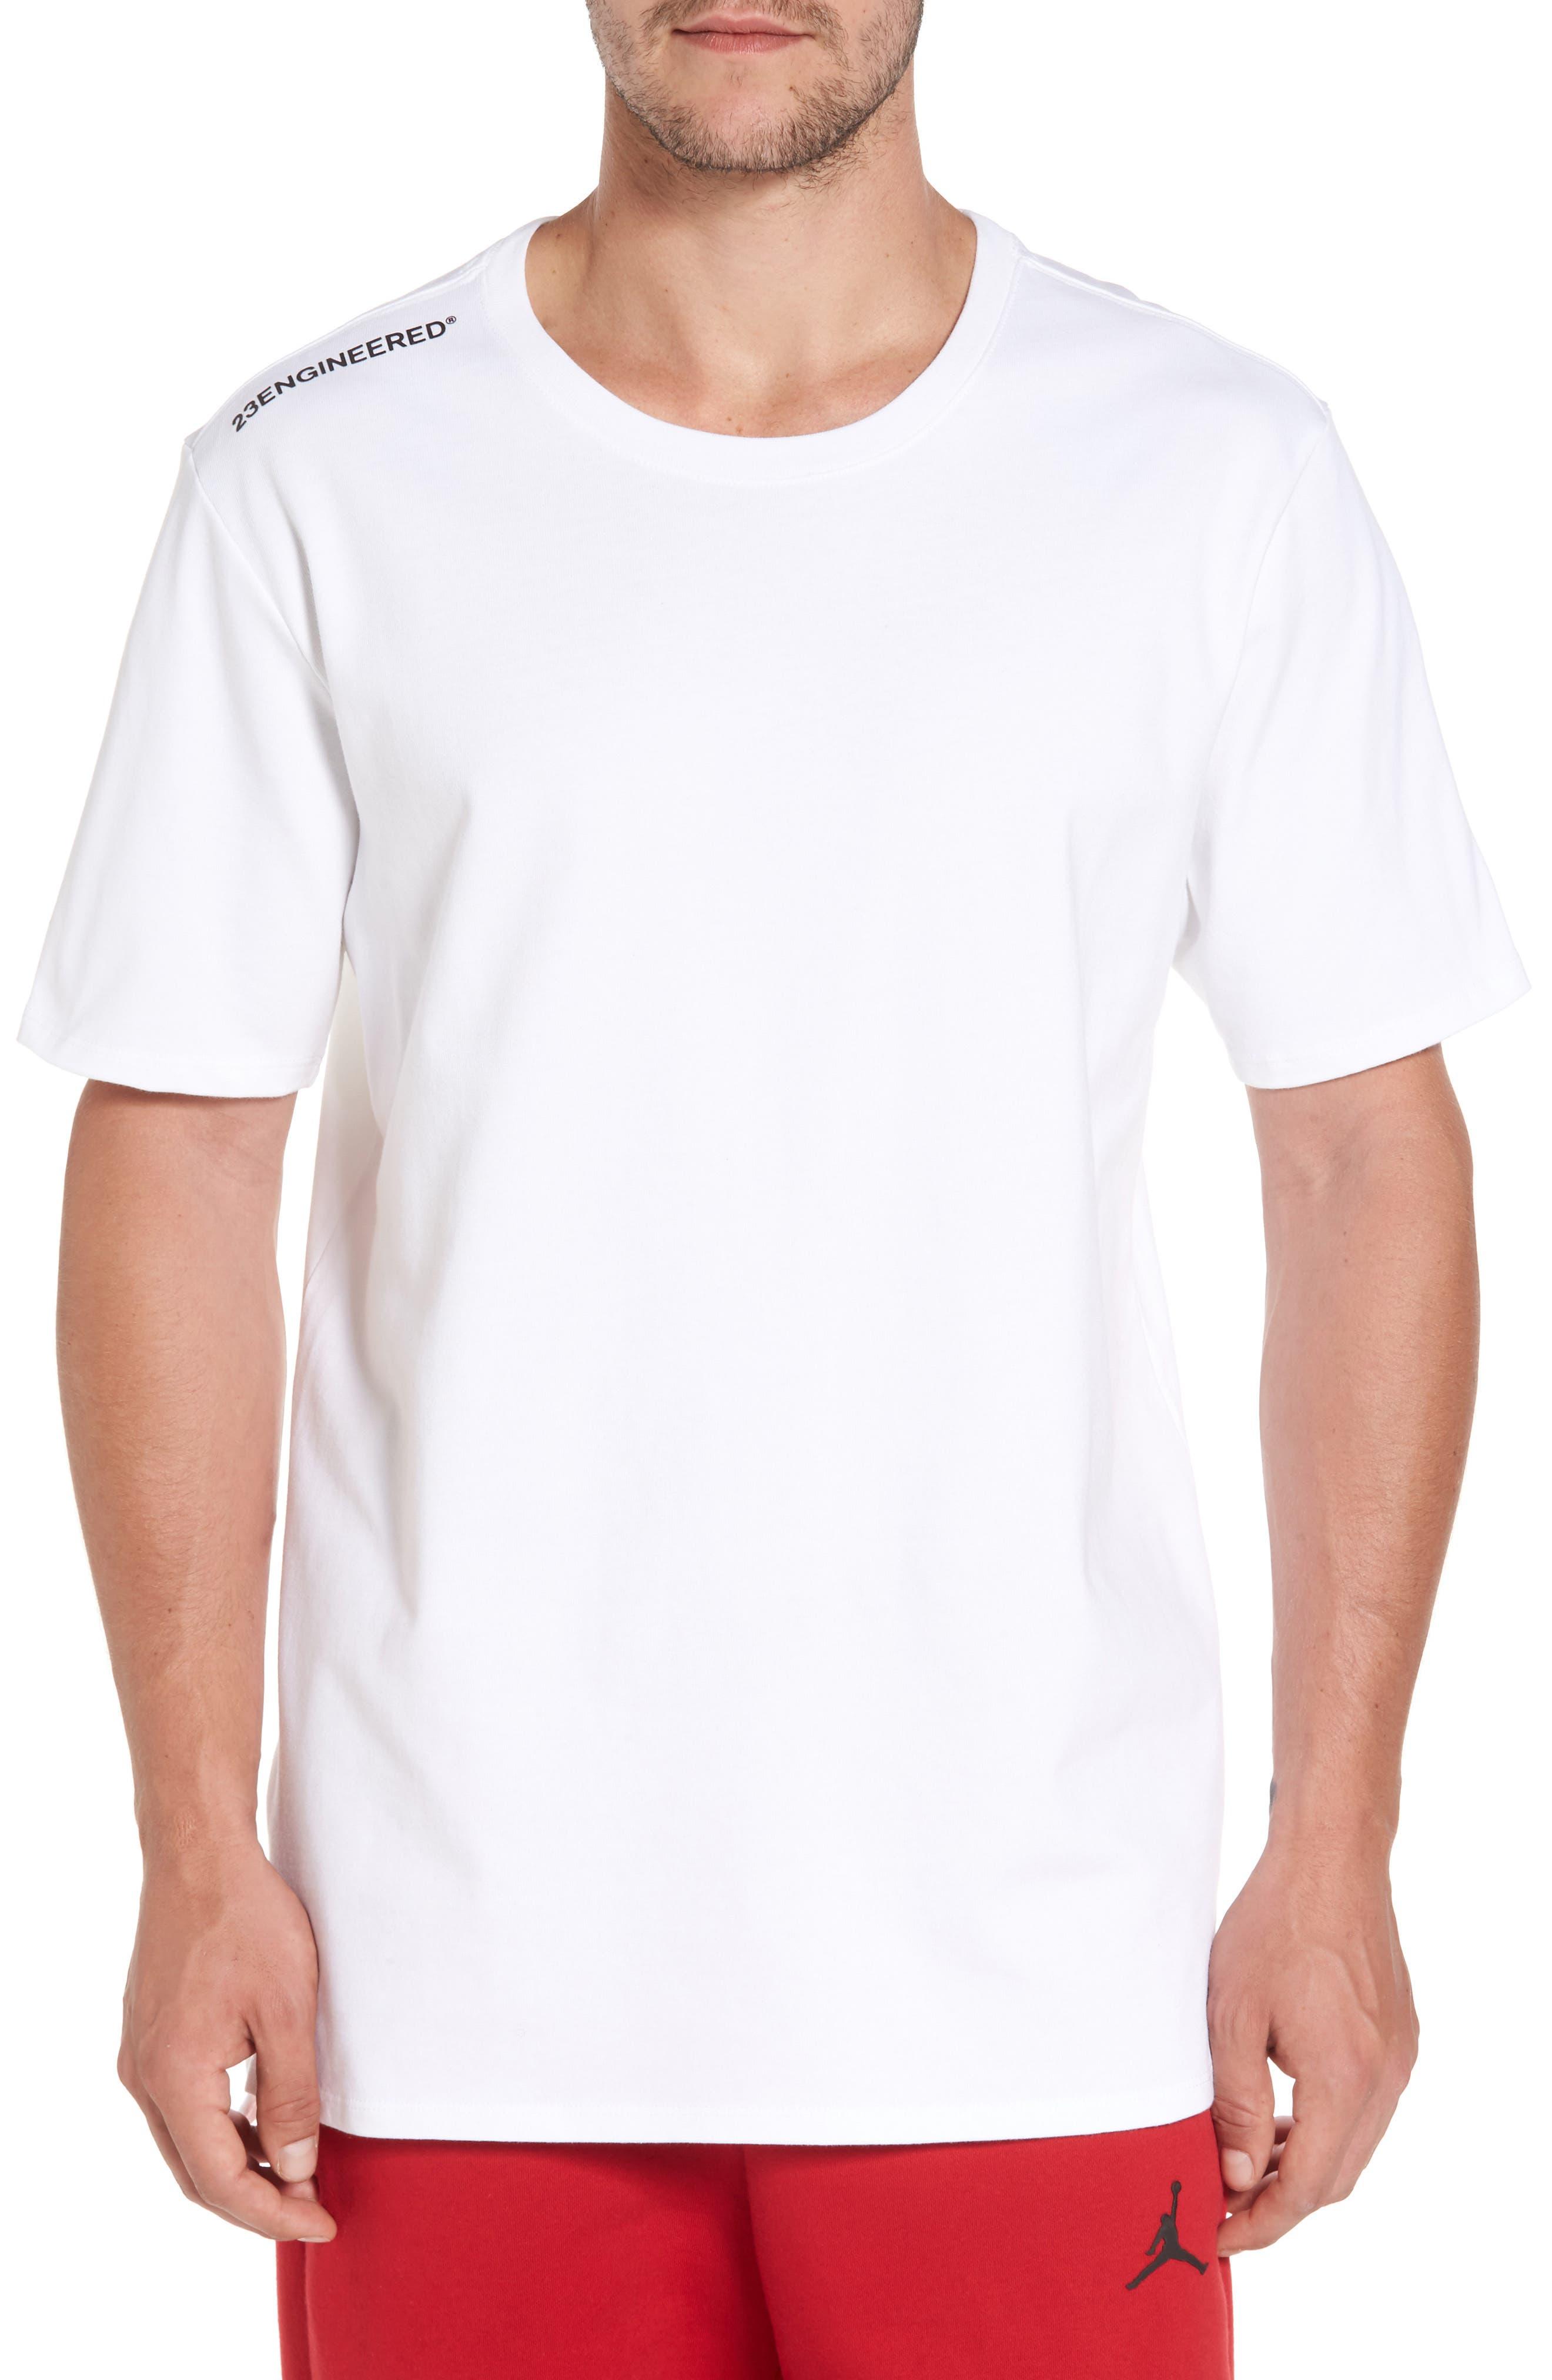 Sportswear 23 Engineered T-Shirt,                         Main,                         color, White/ Black